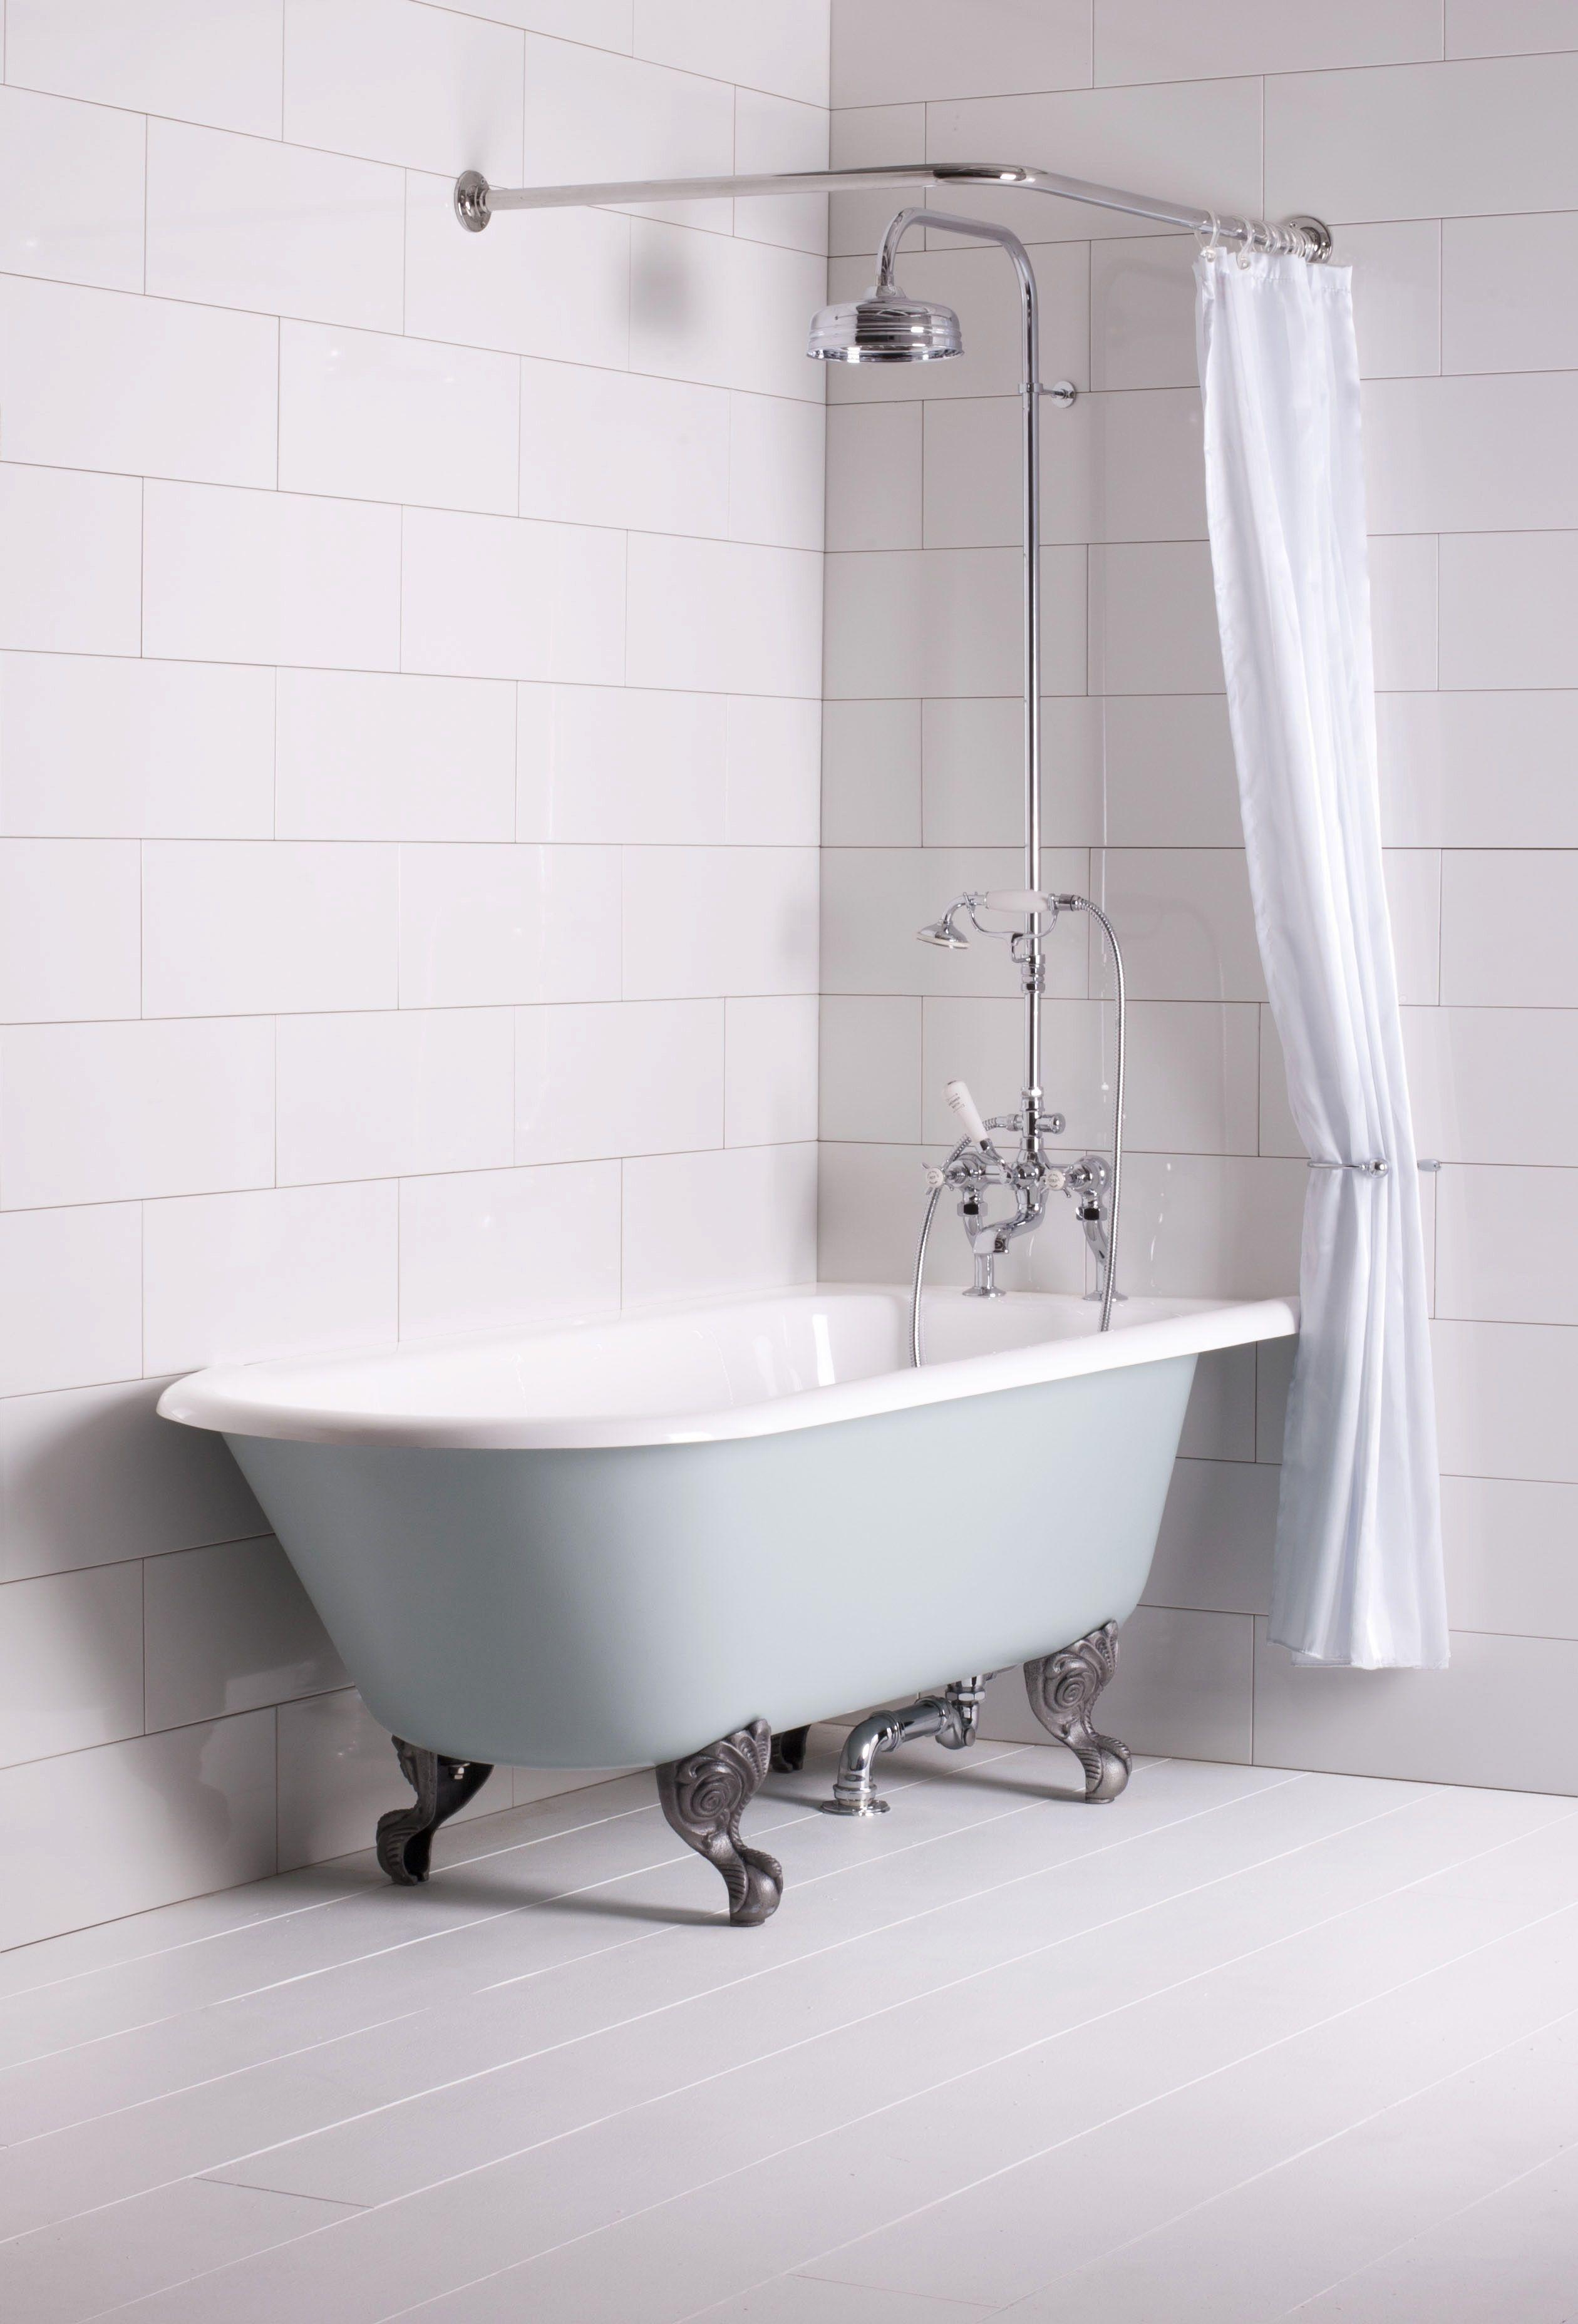 Shower Over Bath Nz Free Standing Tub Combo Freestanding Bathtub